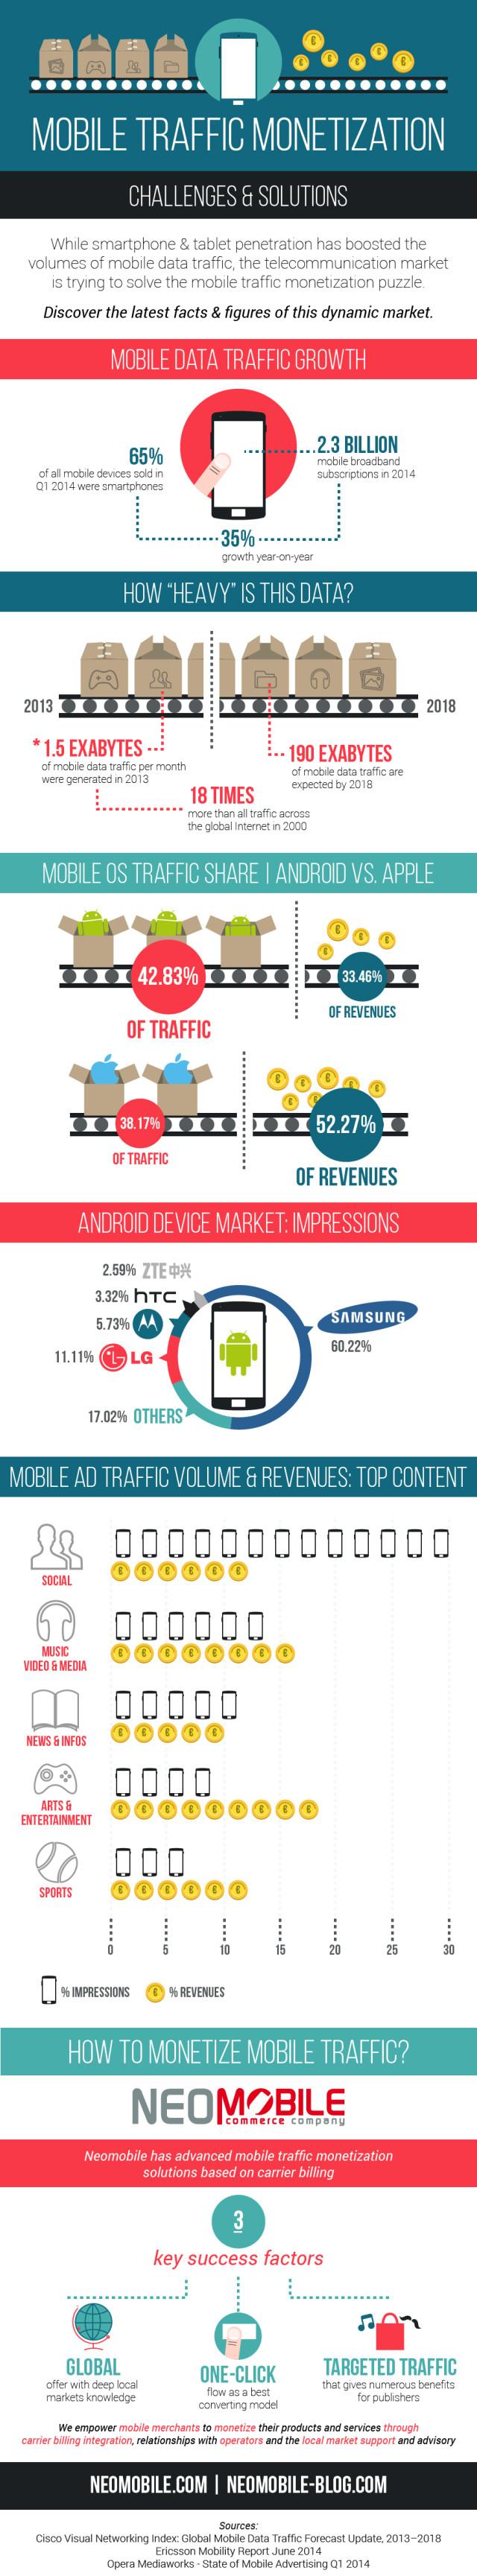 mobile-traffic-monetization-infographic-neomobile